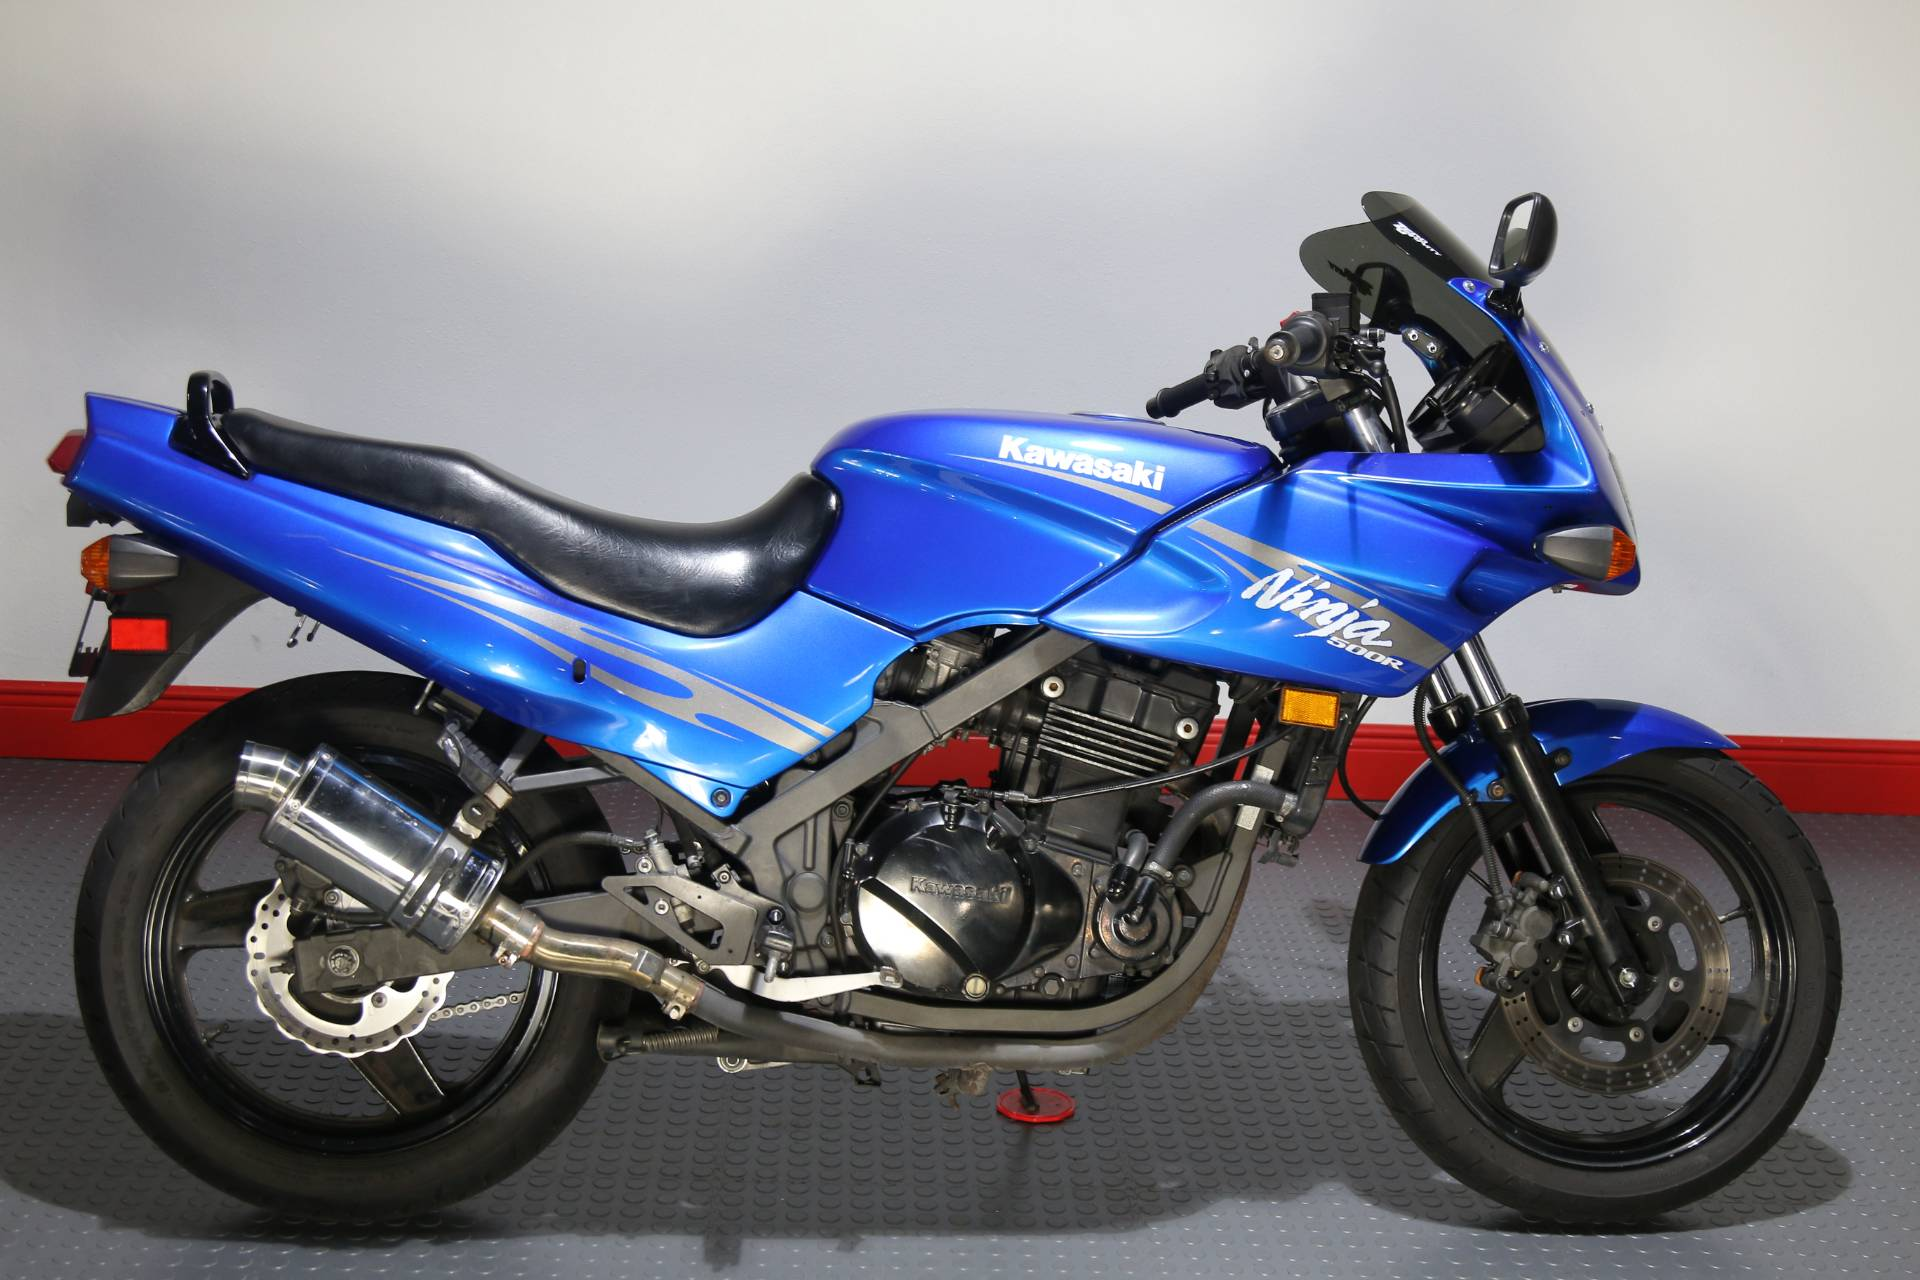 used 2009 kawasaki ninja® 500r motorcycles in pinellas park, fl